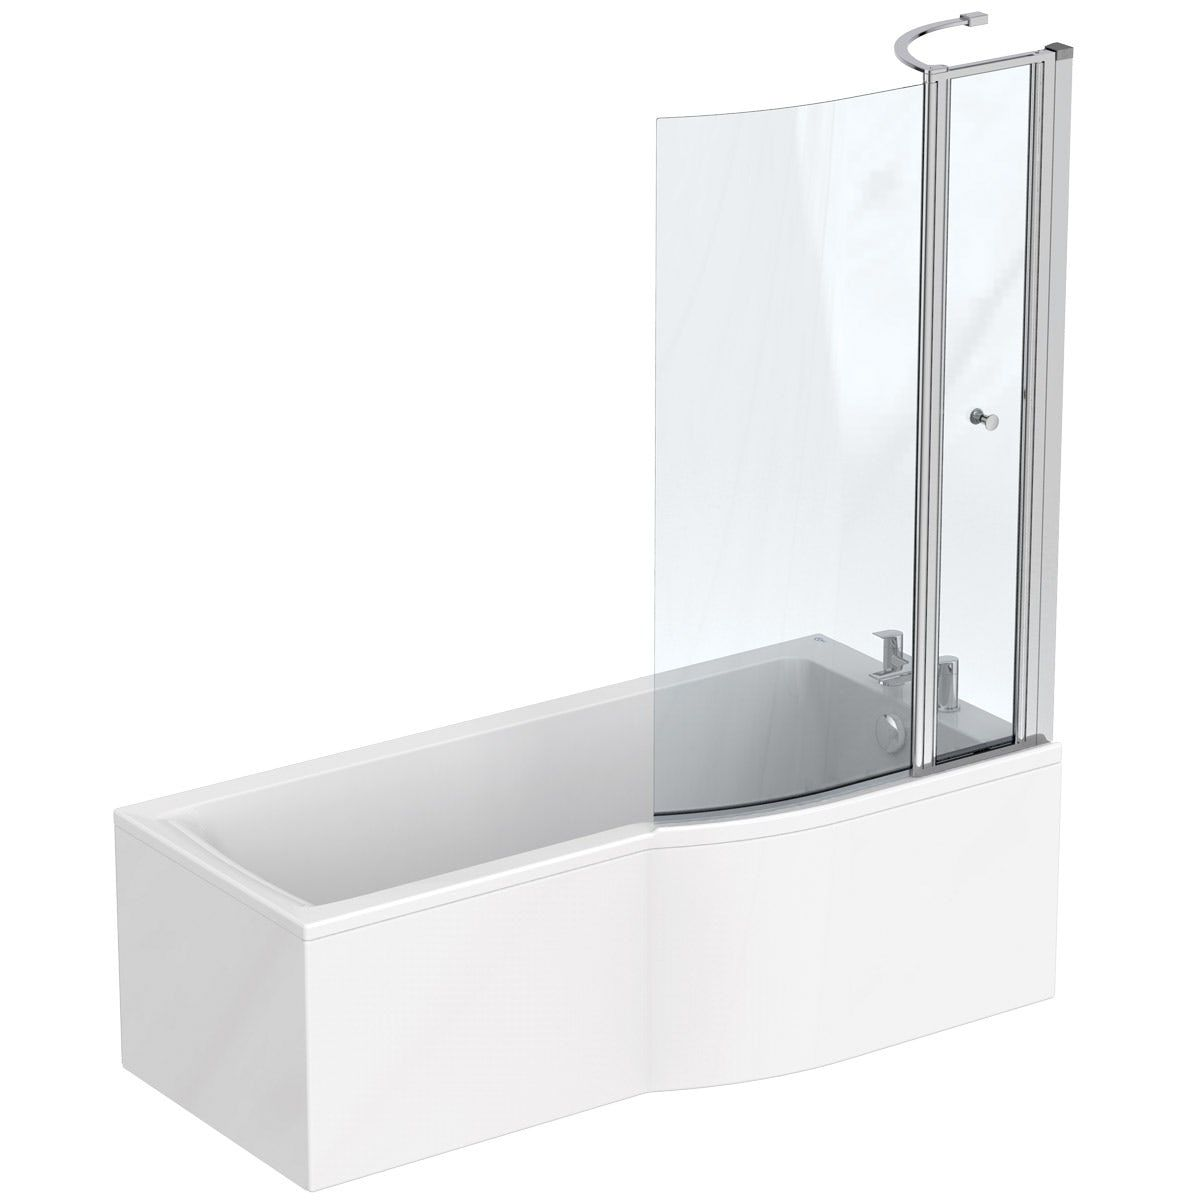 Ideal Standard Concept Air Idealform Right Hand Shower